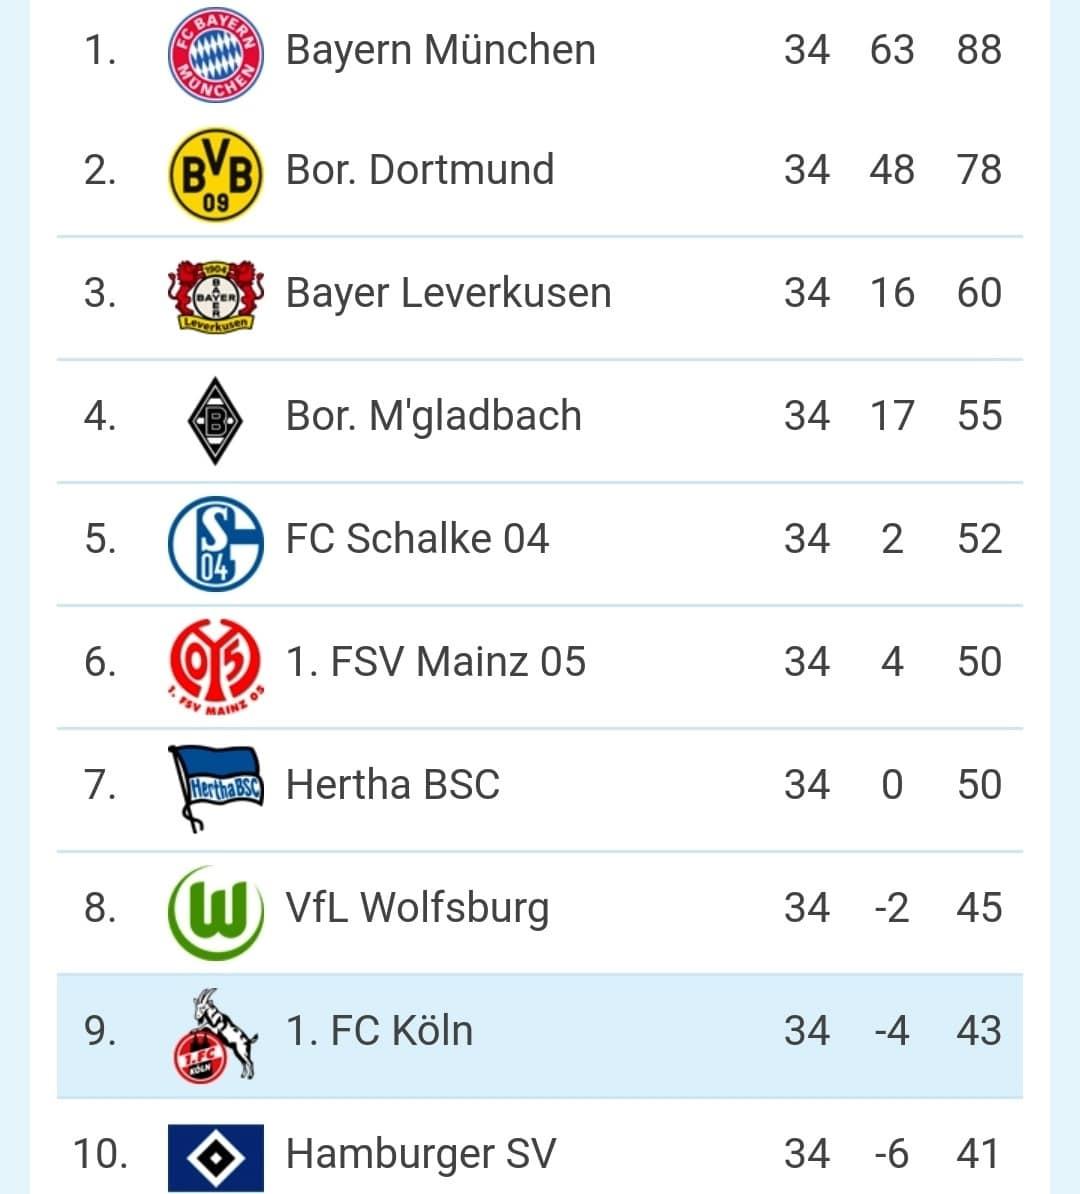 Auf Platz 9 schloss der 1. FC Köln ab. copyright: CityNEWS